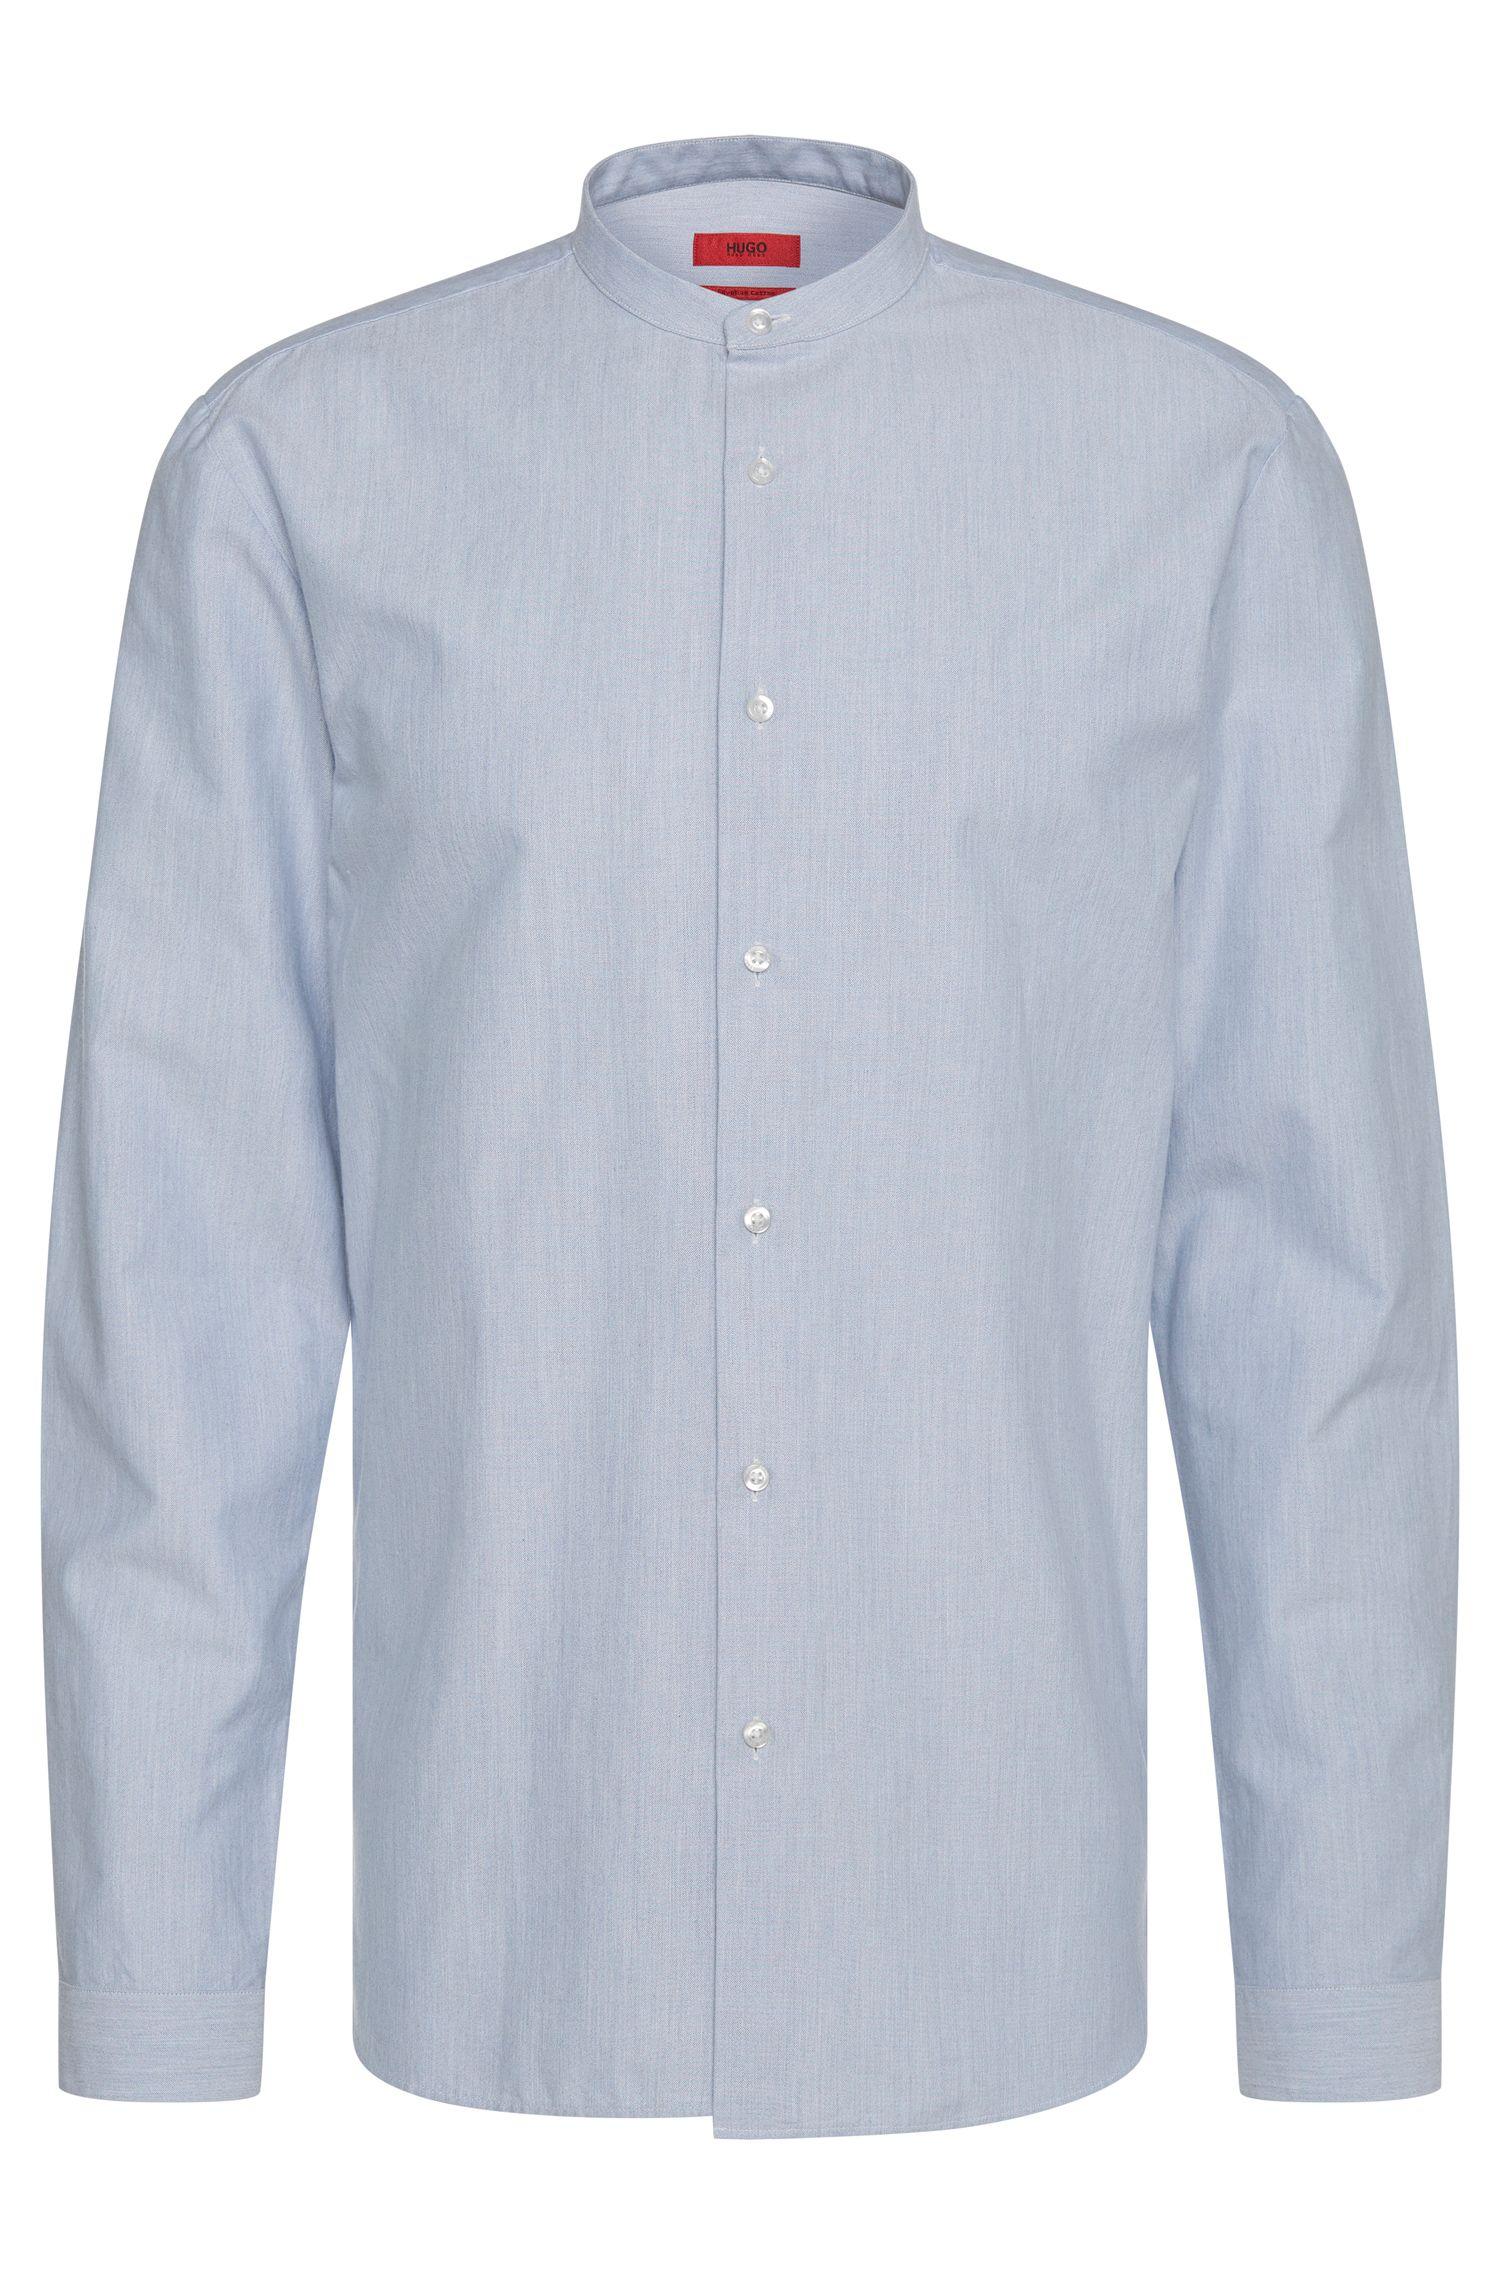 'Eddison' | Regular Fit, Cotton Button Down Shirt